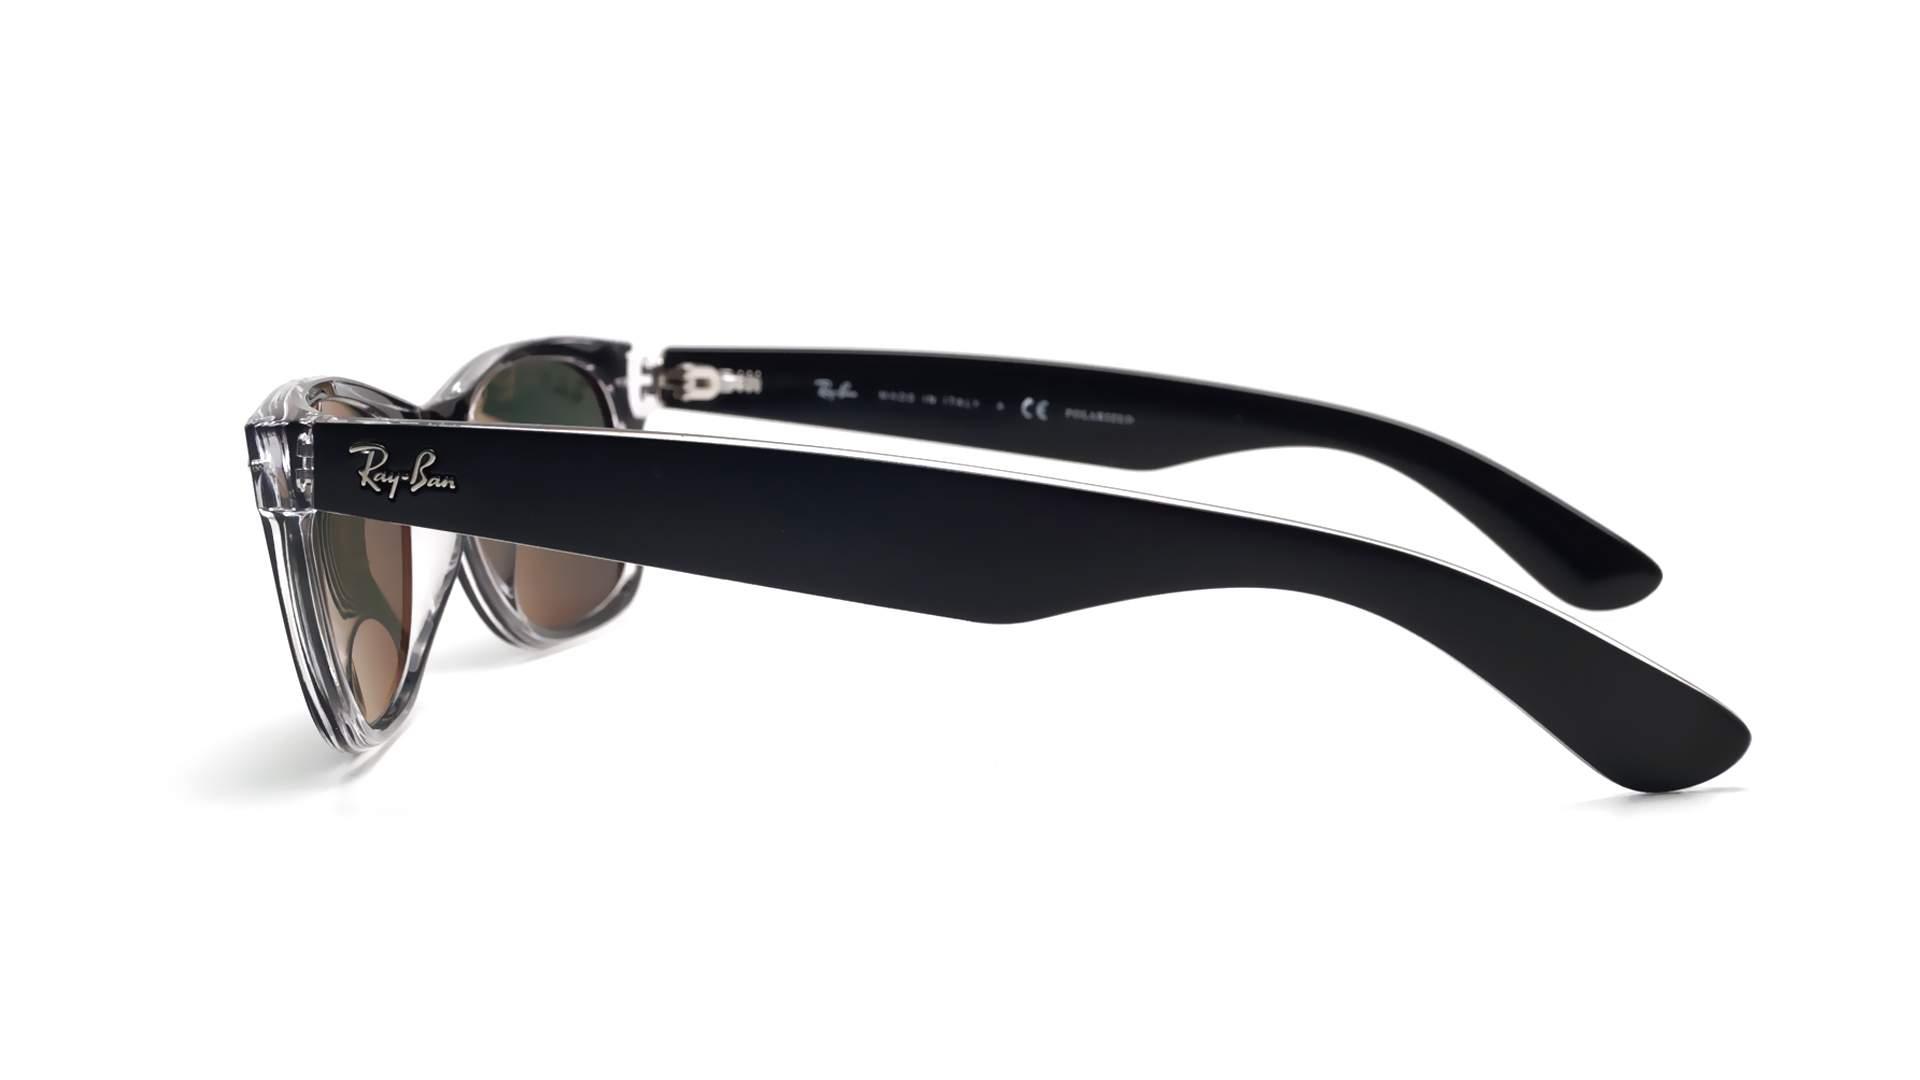 6dc0d131eb4 Sunglasses Ray-Ban New Wayfarer Black RB2132 6052 58 55-18 Large Polarized